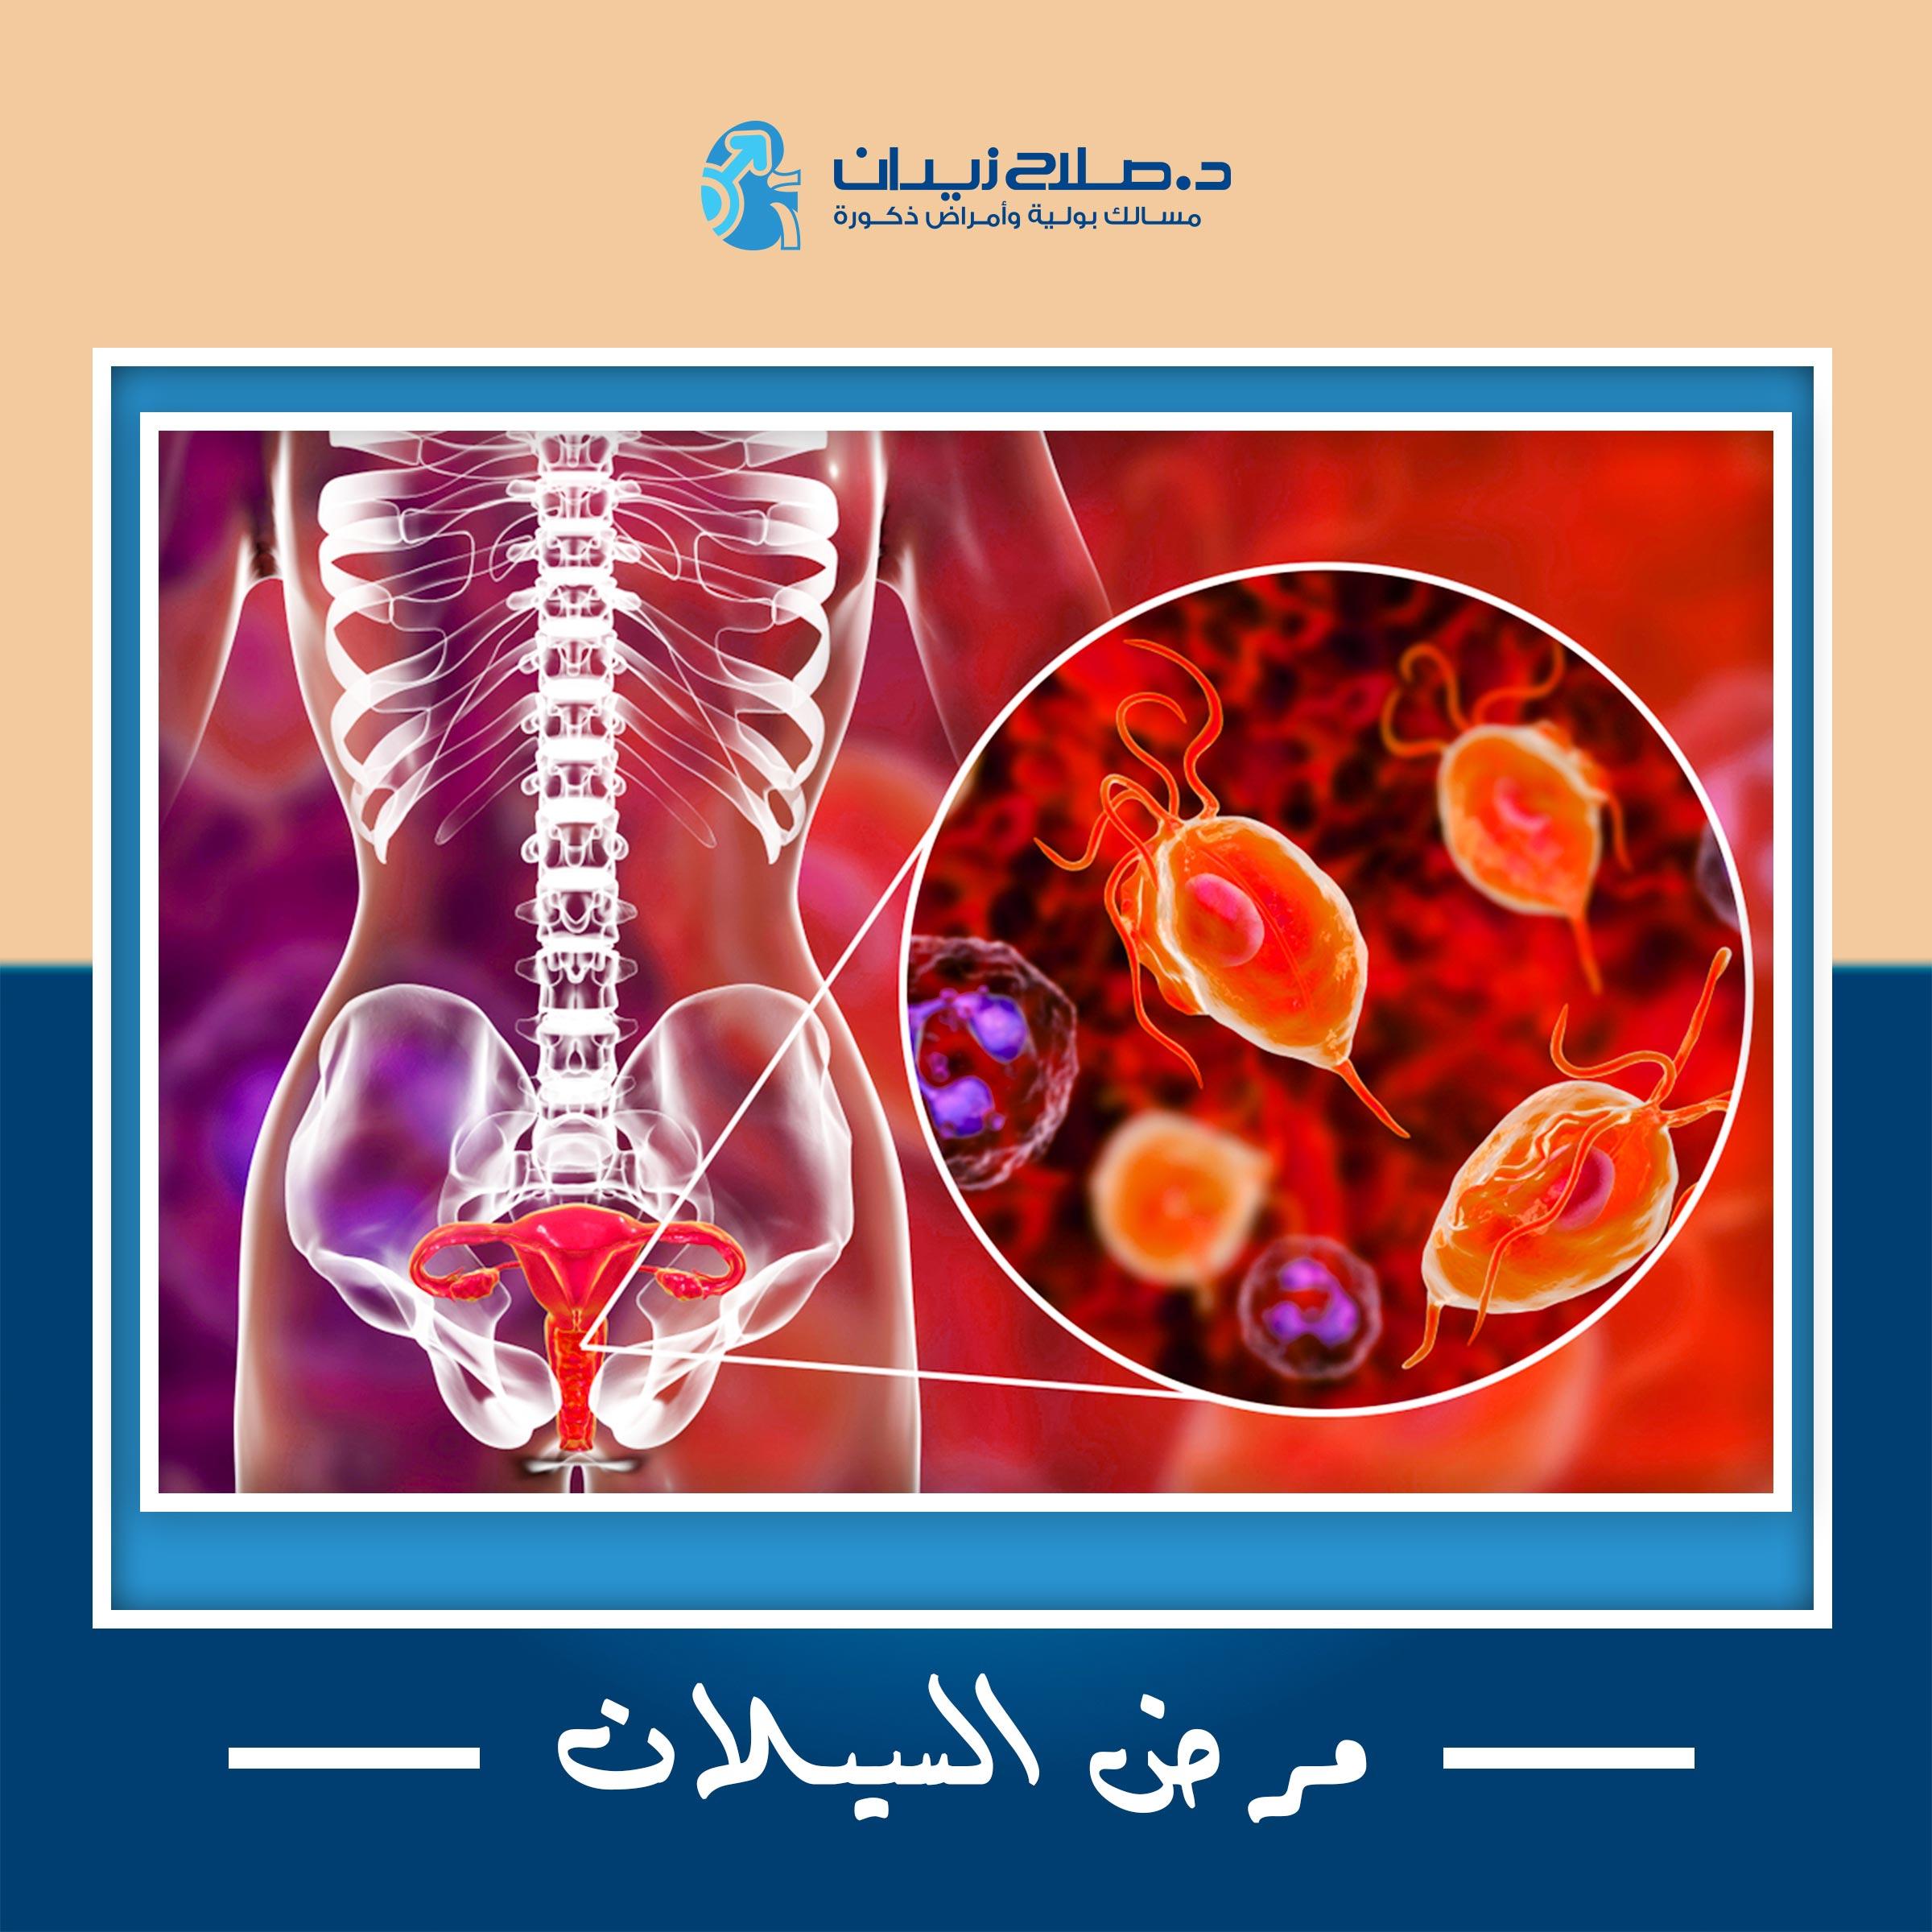 مرض السيلان